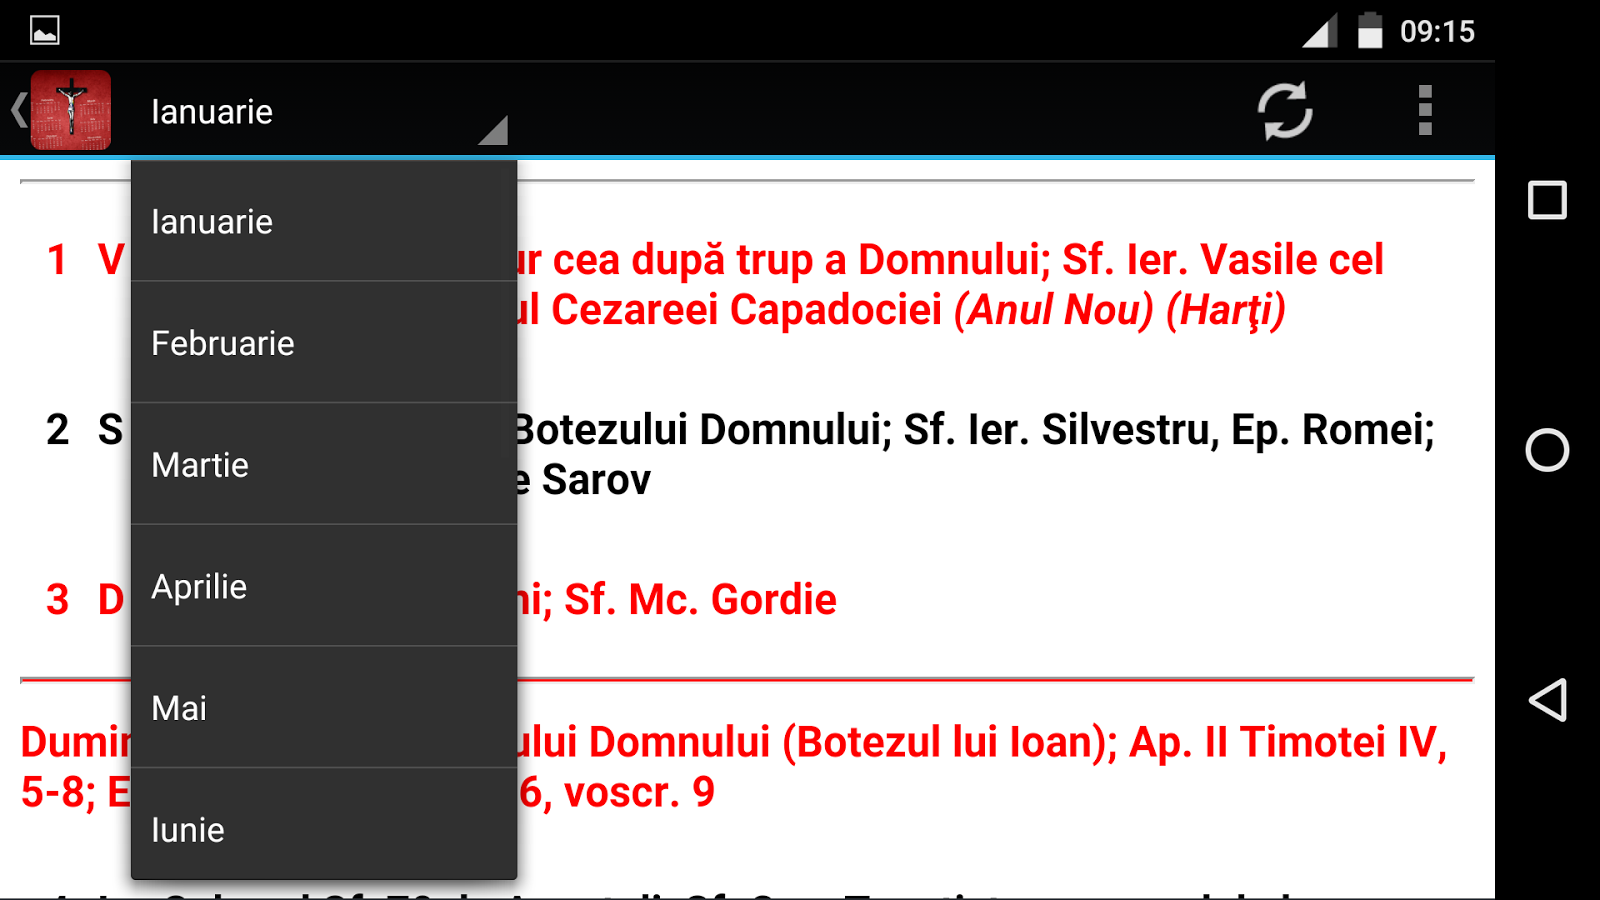 Calendar Ortodox Romania 2016 - Android Apps on Google Play